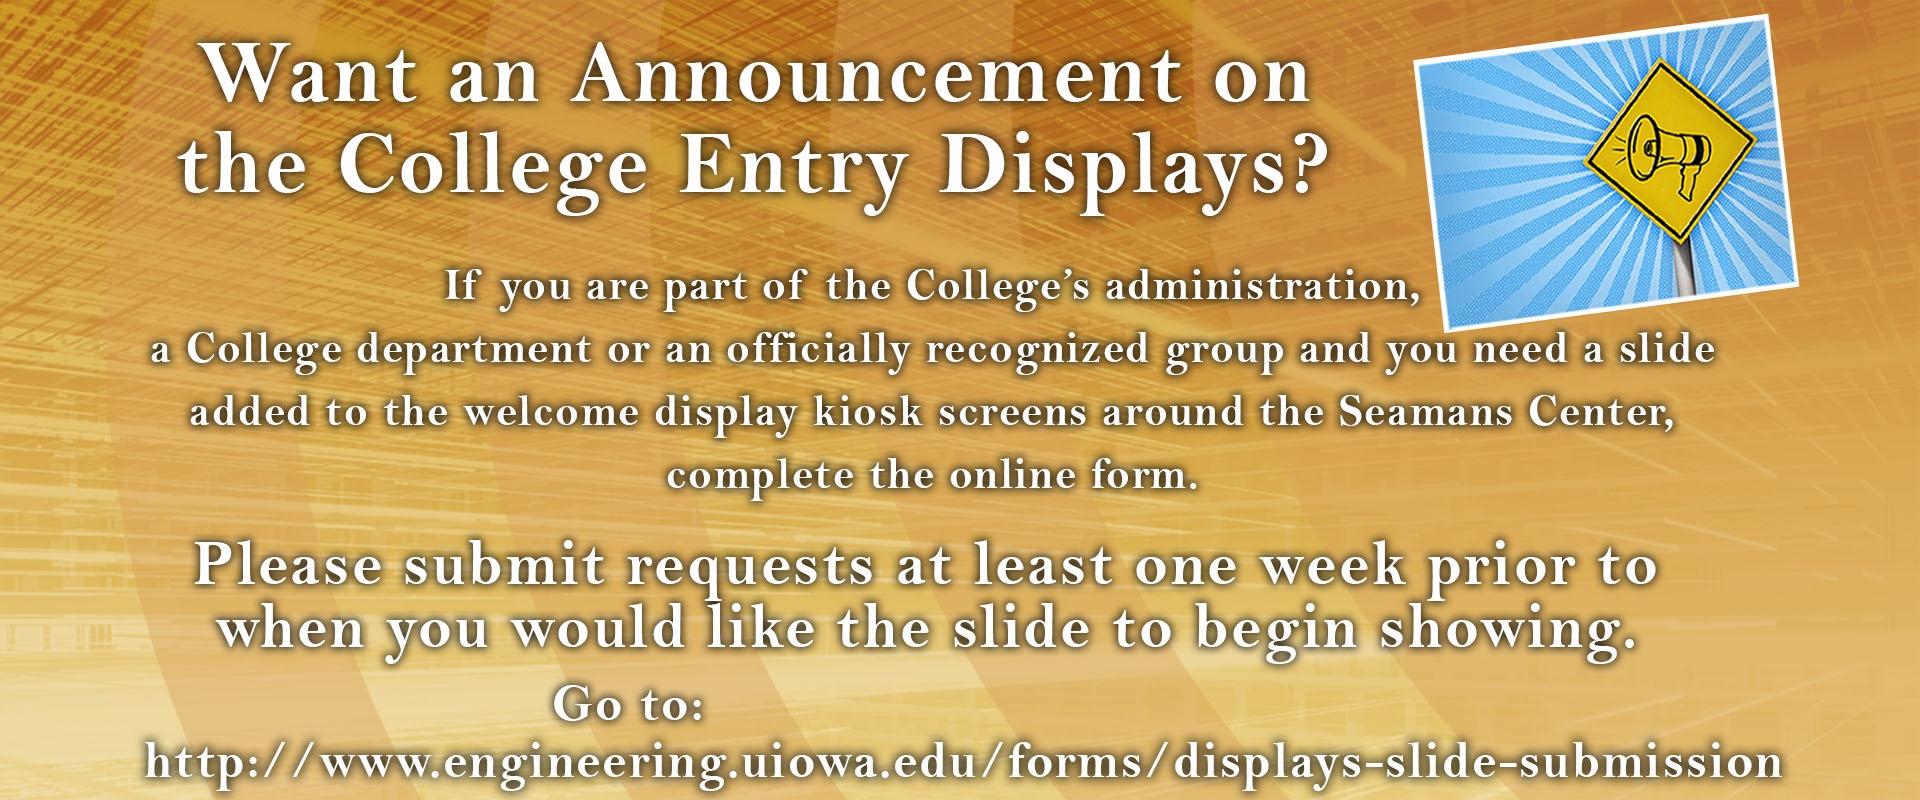 current-coe-kiosk-displays-slide-submission.jpg